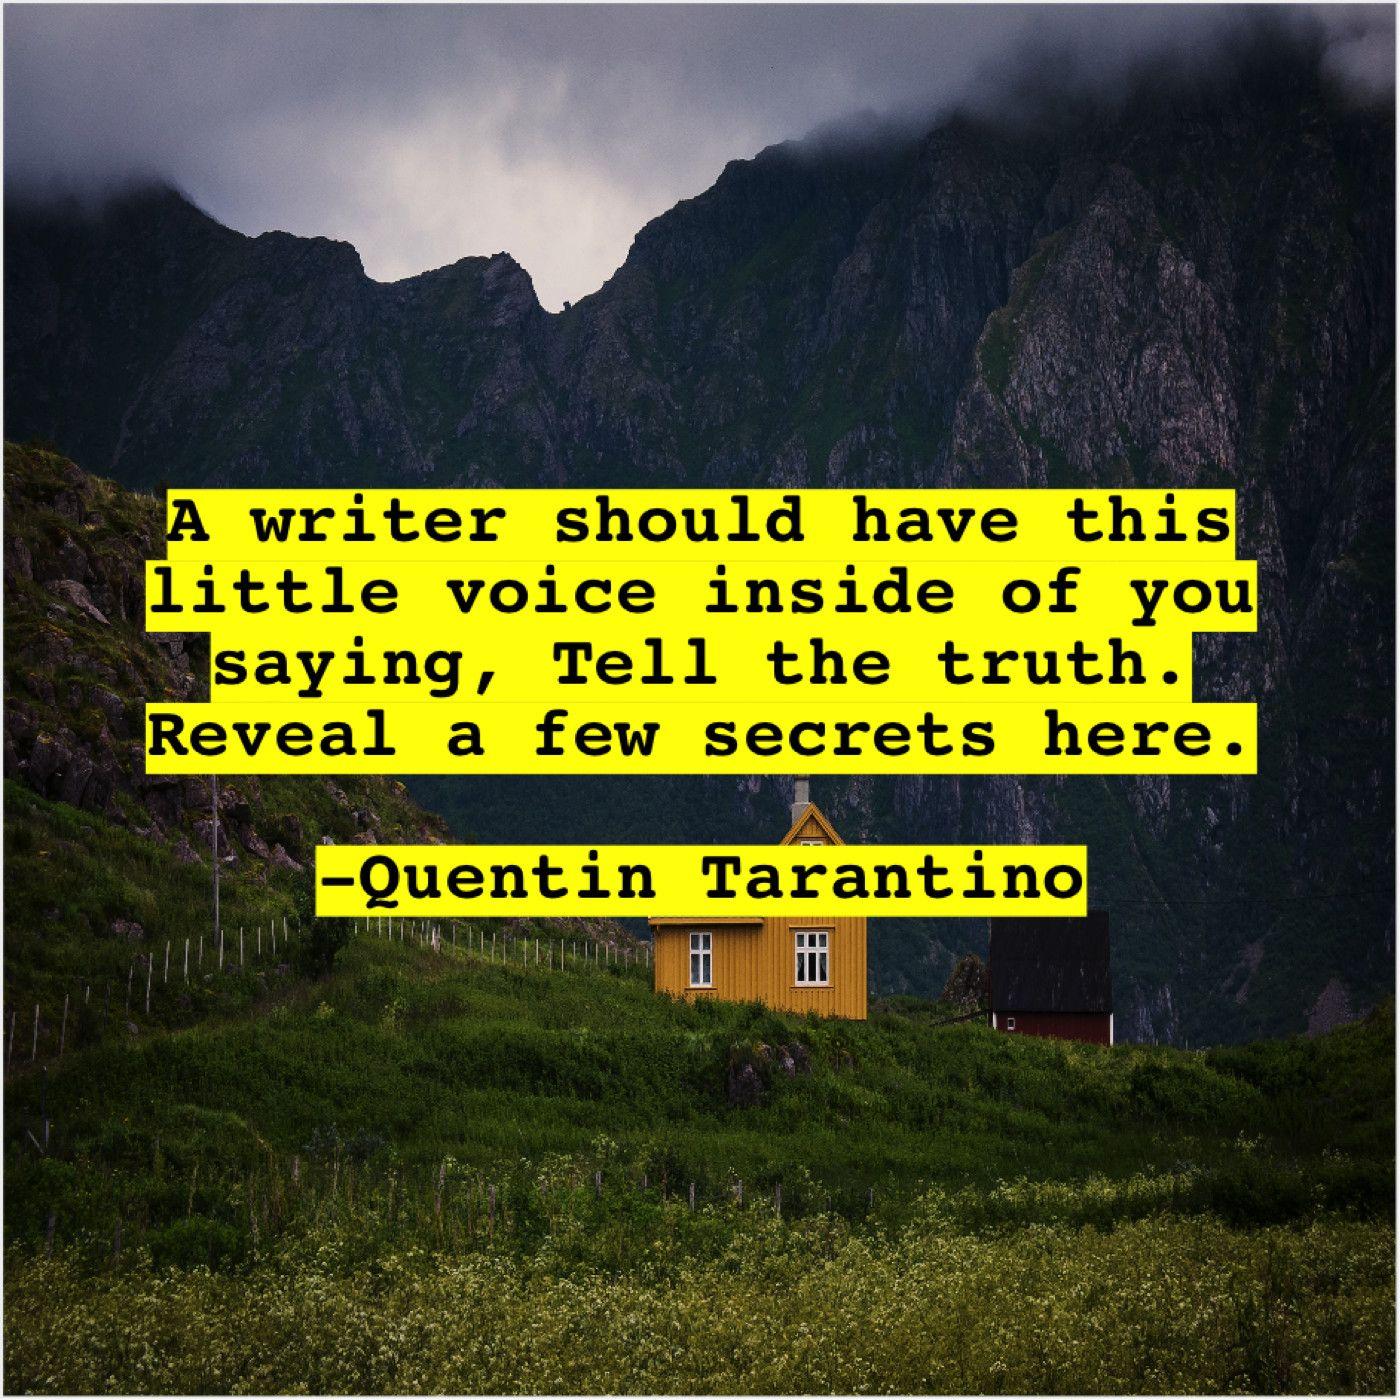 Quentin Tarantino A Writer Should Have This Demetri Martin Annie Leibovitz Jason Mraz